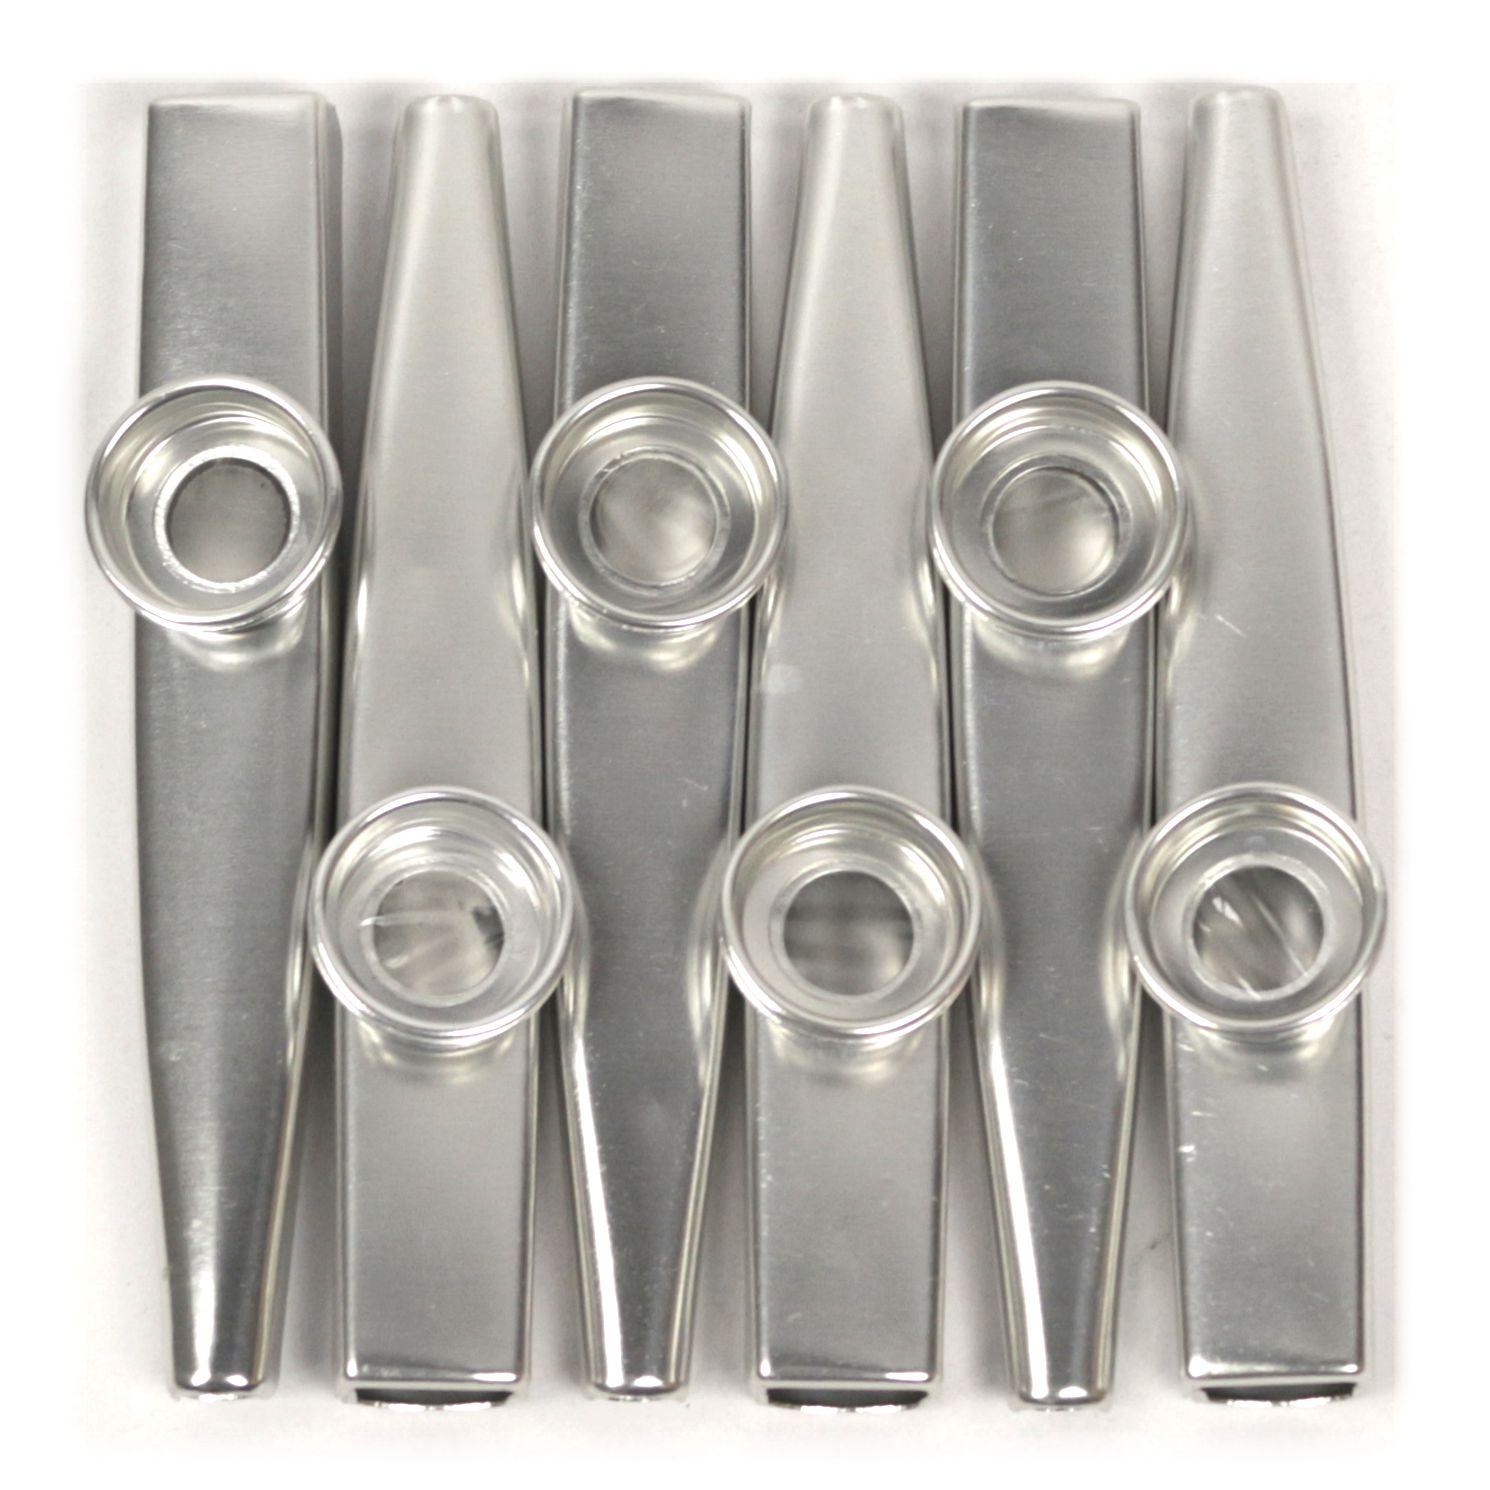 Kazoo em Metal Profissional Kazoobob Silver Prata - 06 Unidades